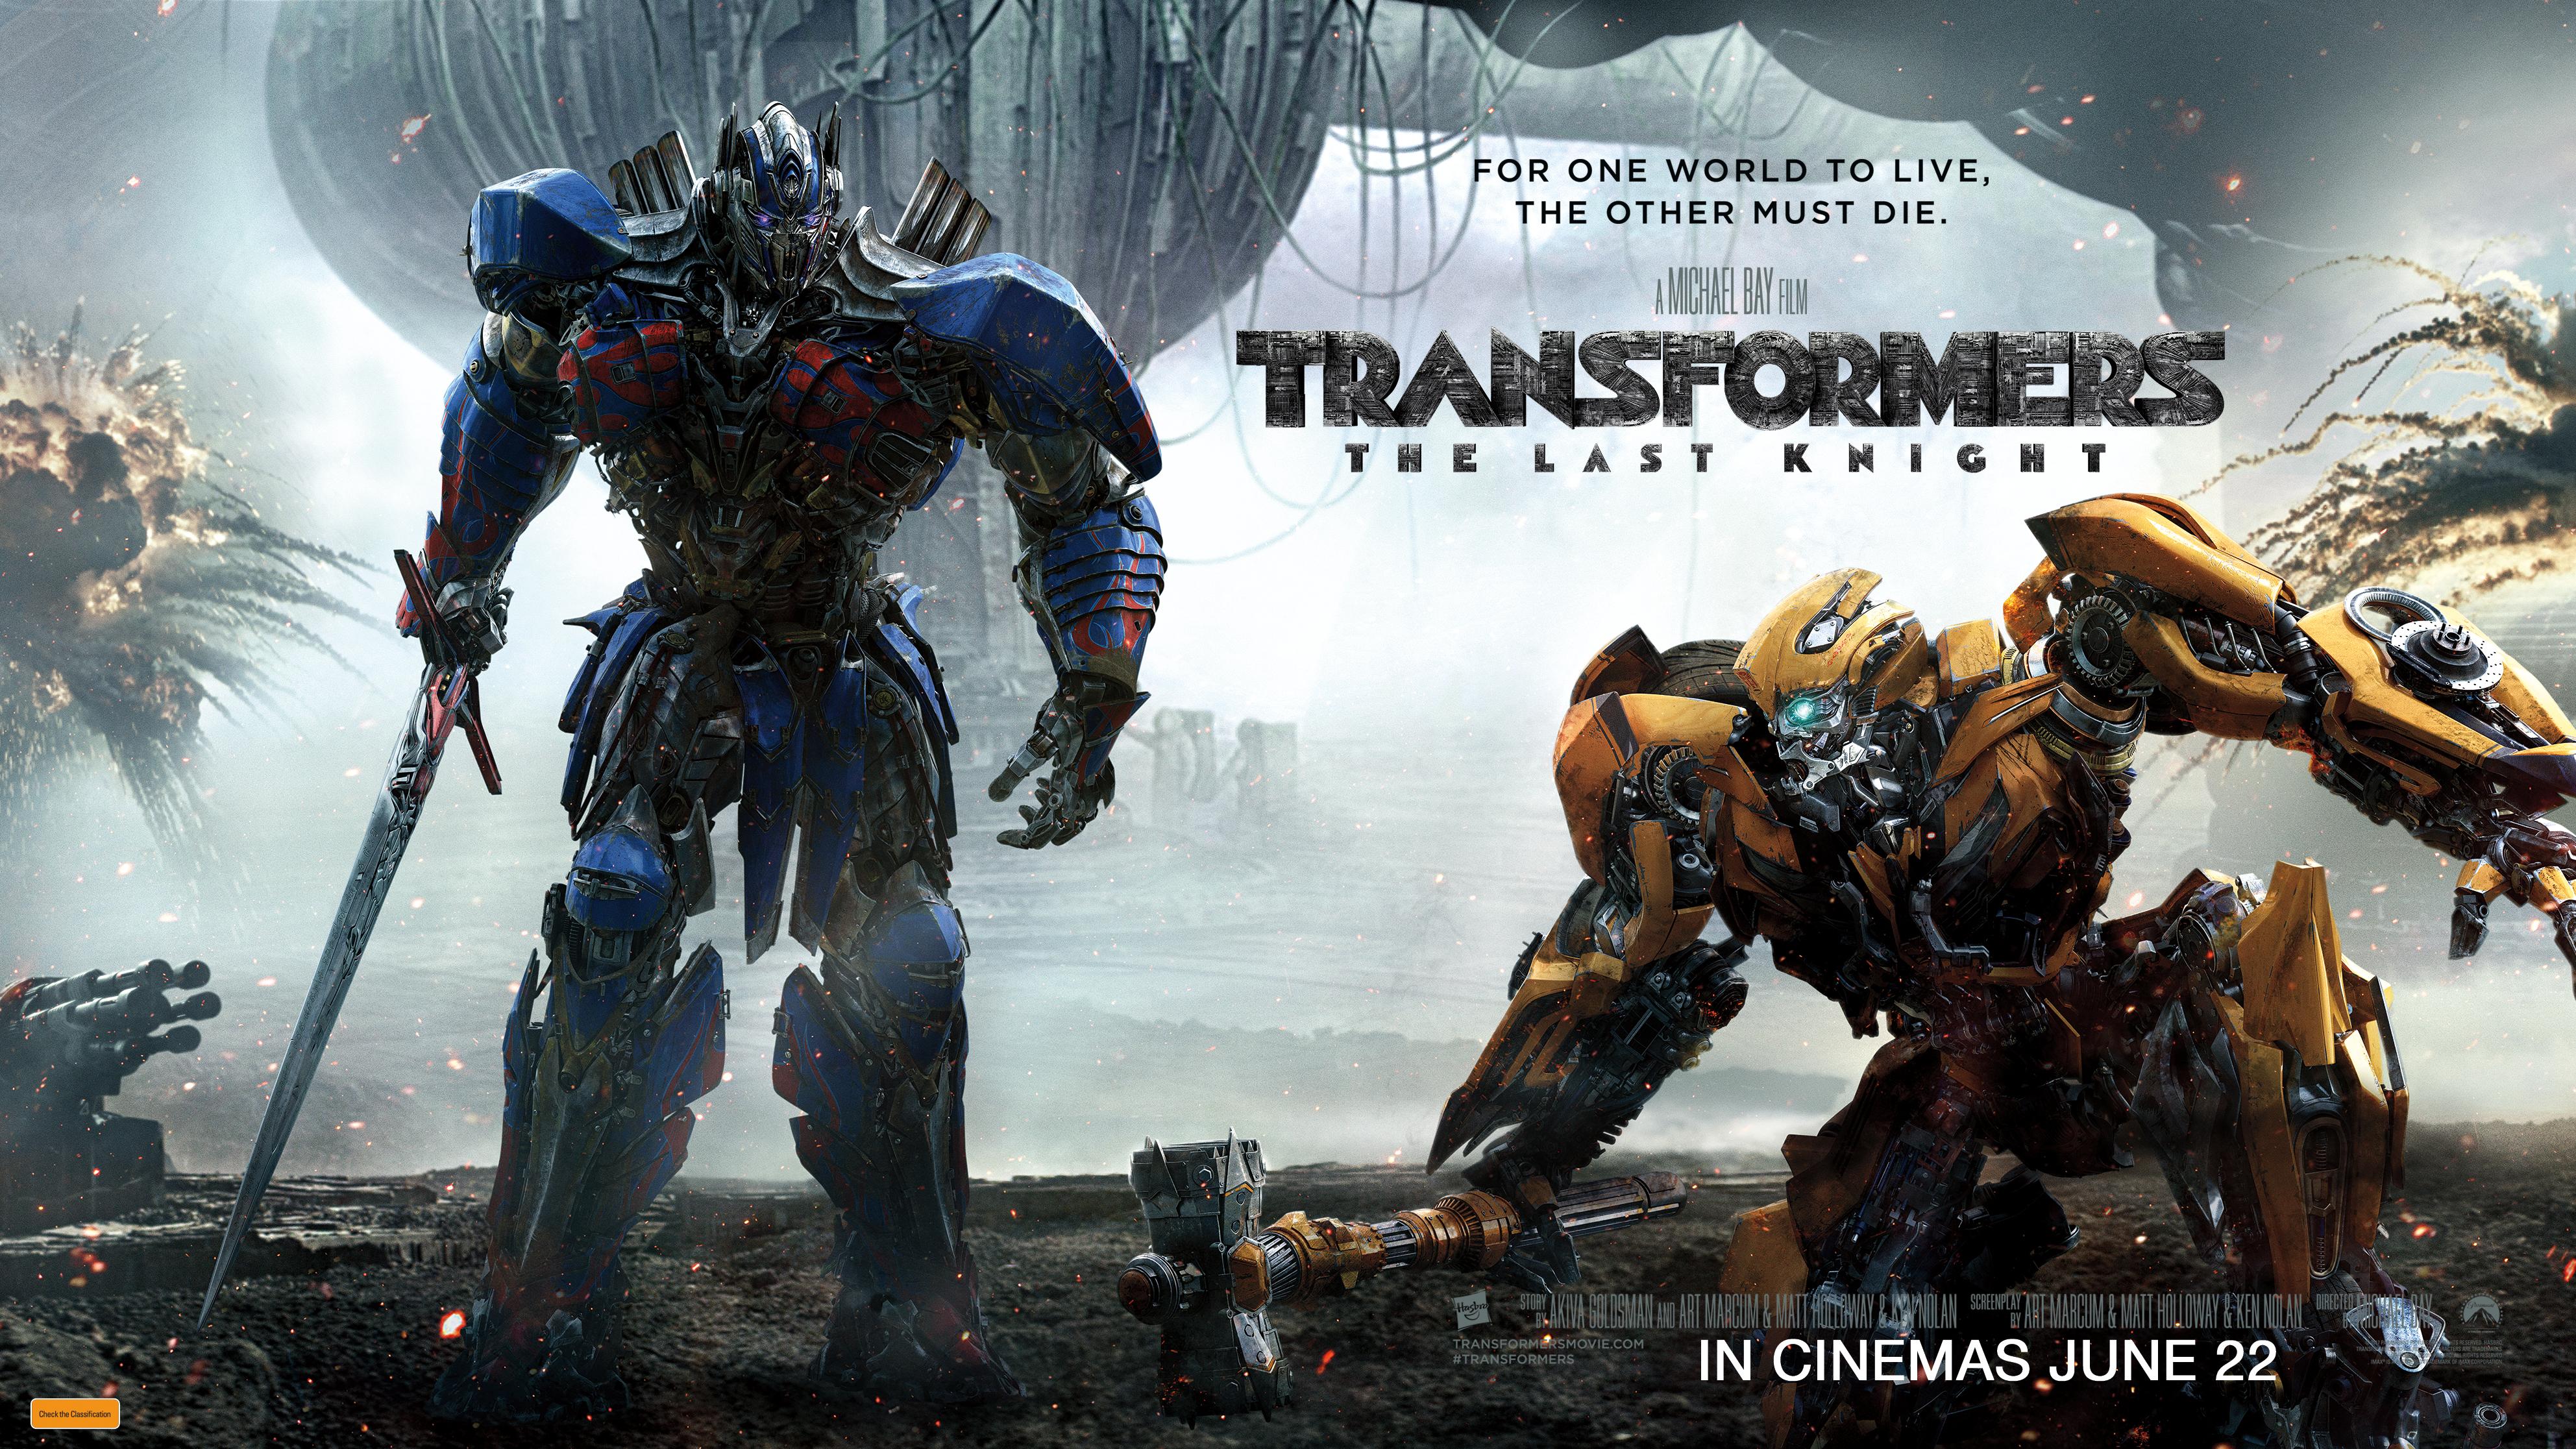 Optimus Prime Vs Bumblebee 4k Ultra Hd Wallpaper Background Image